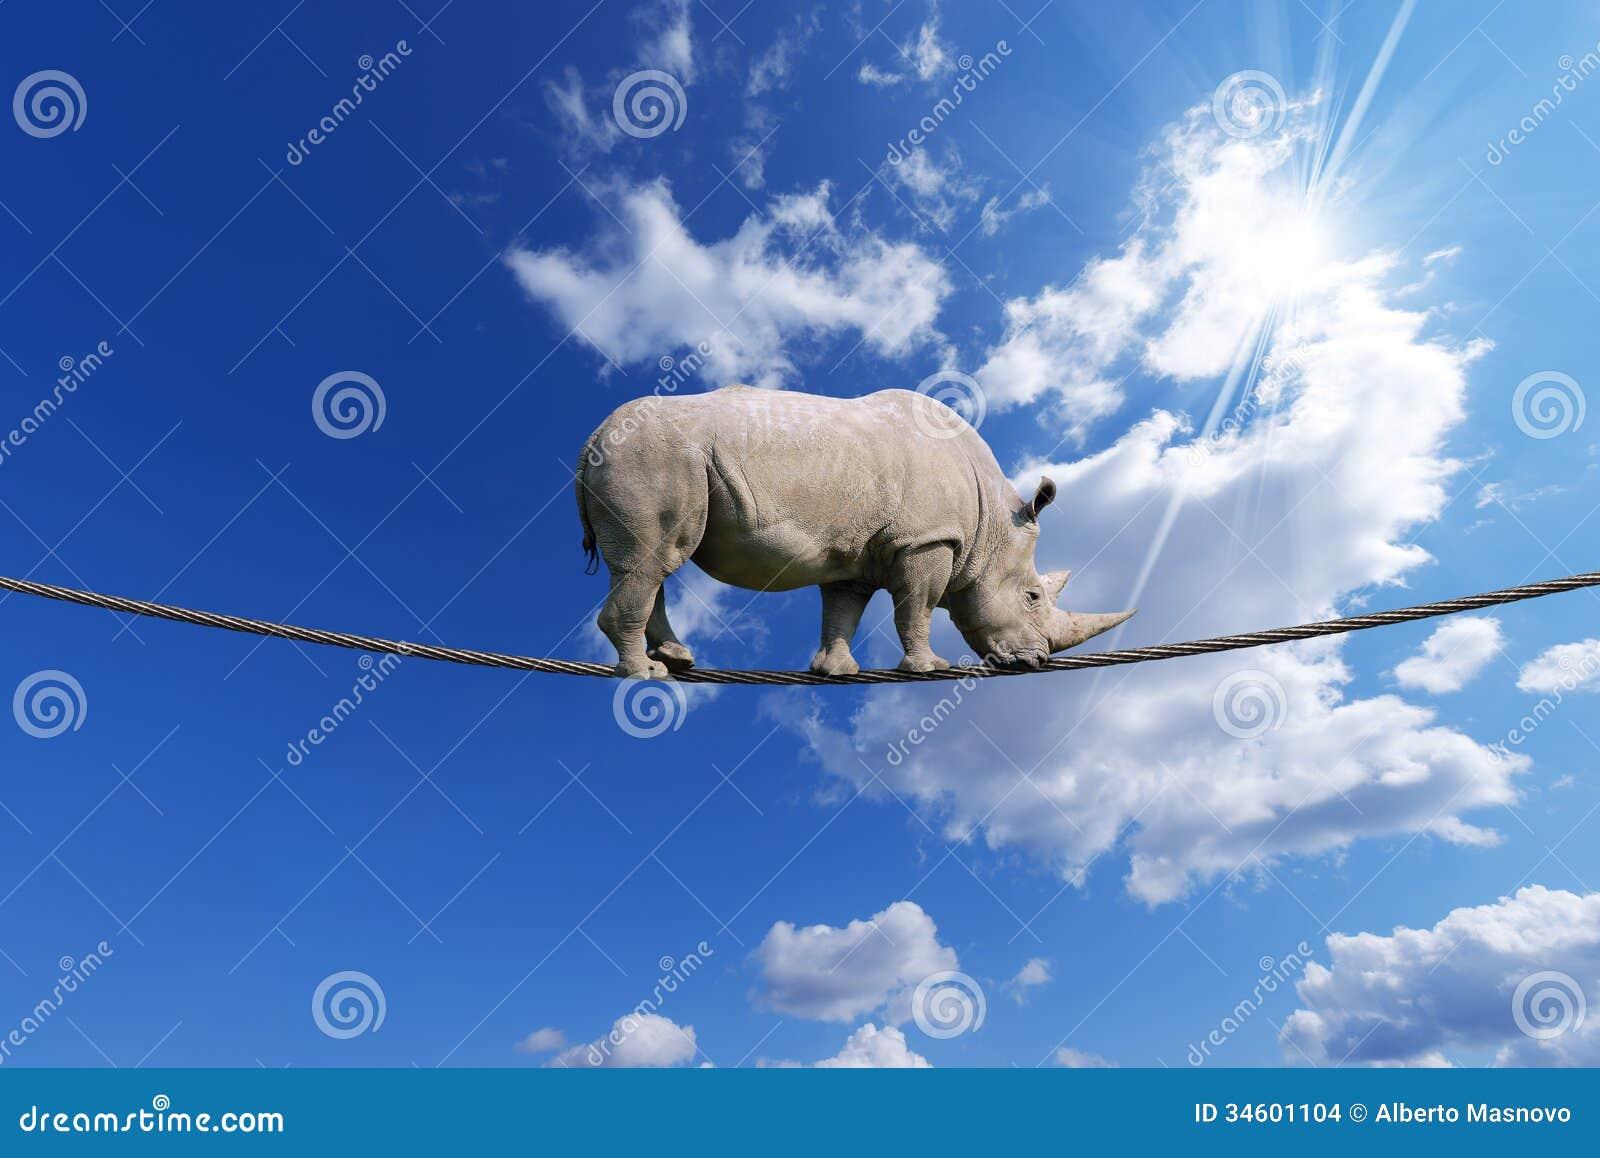 Rhino Walking on Rope stock illustration  Illustration of africa